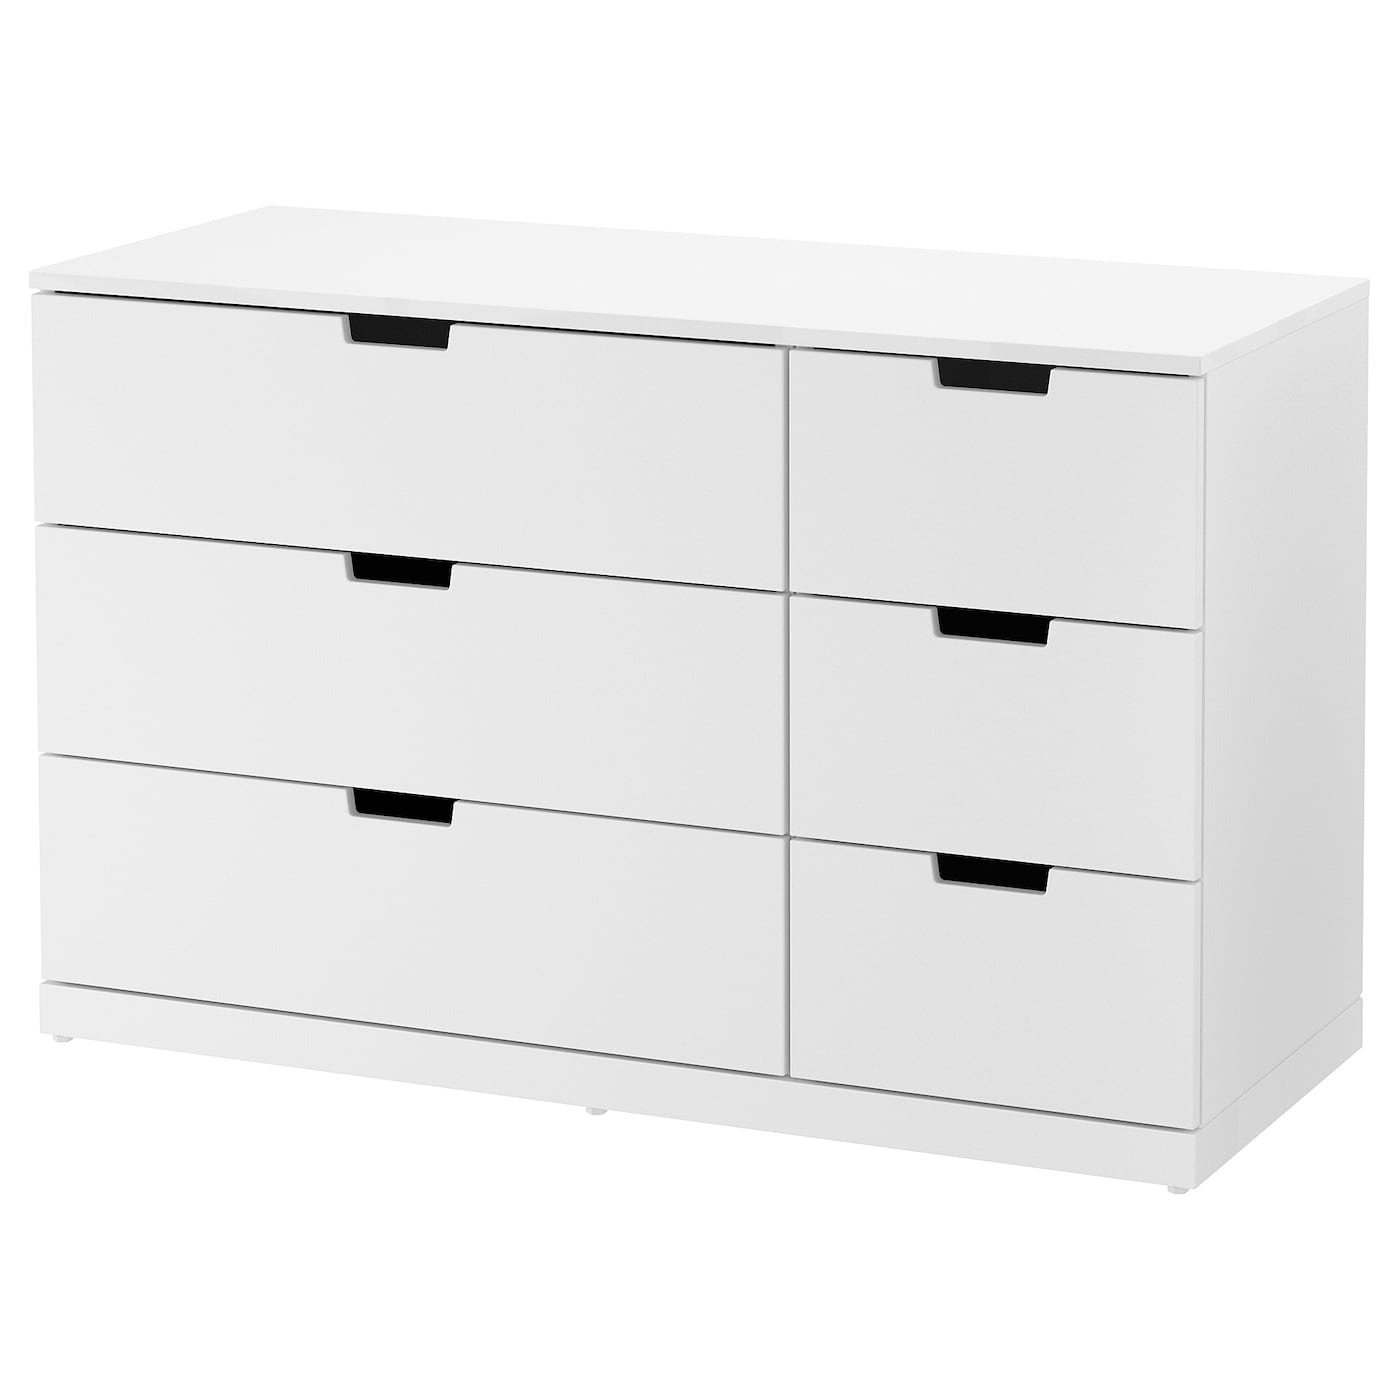 nordli commode 6 tiroirs blanc 120x76 cm ikea. Black Bedroom Furniture Sets. Home Design Ideas